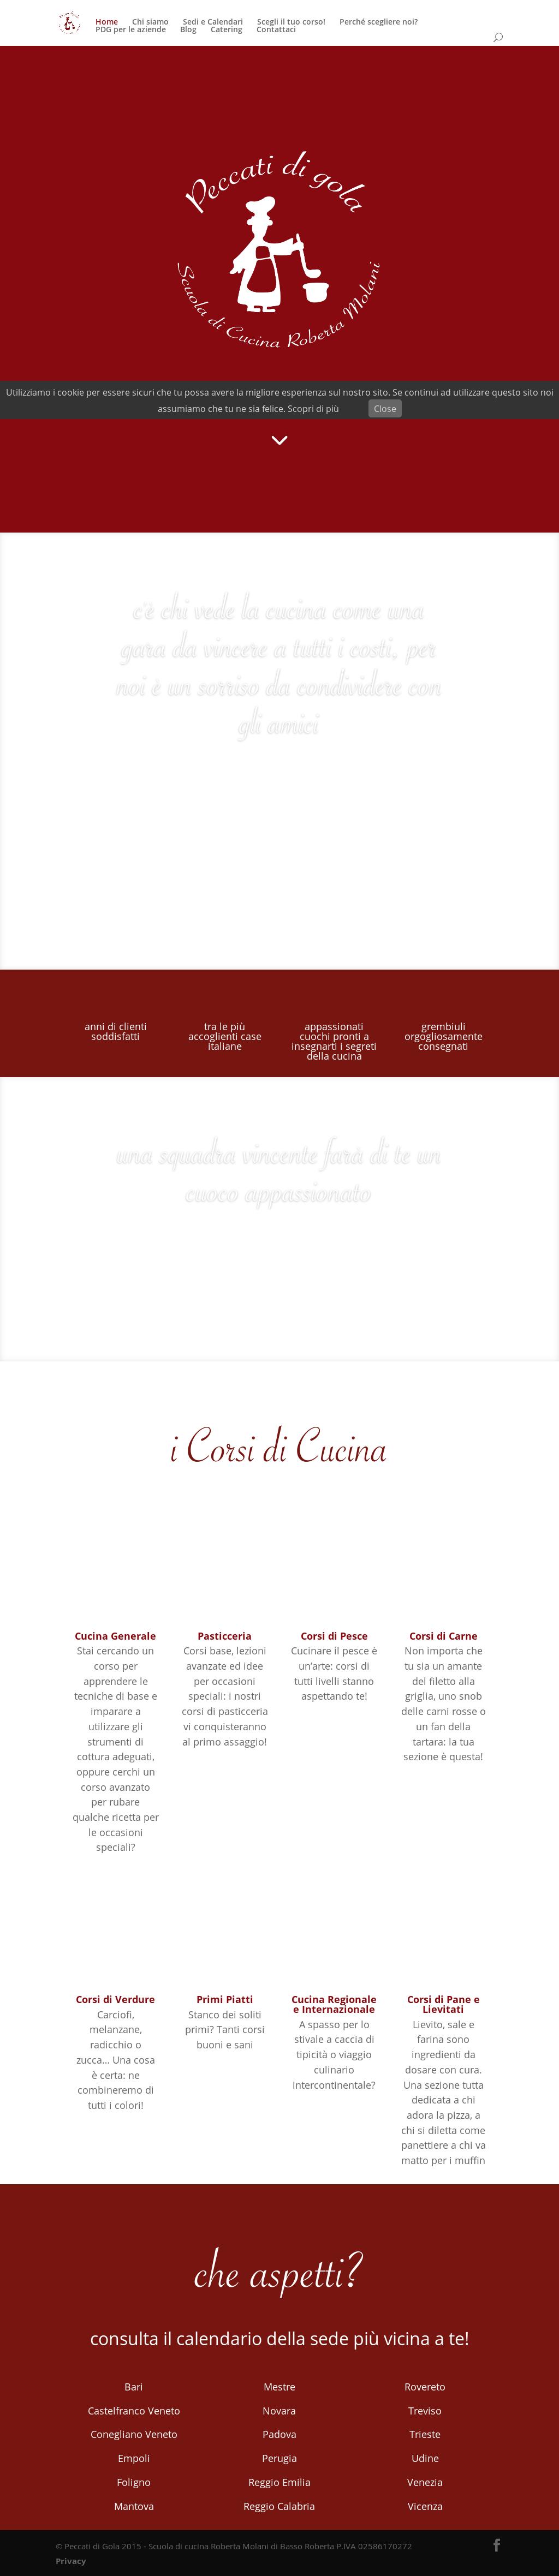 I Segreti Del Pane peccatidigola competitors, revenue and employees - owler